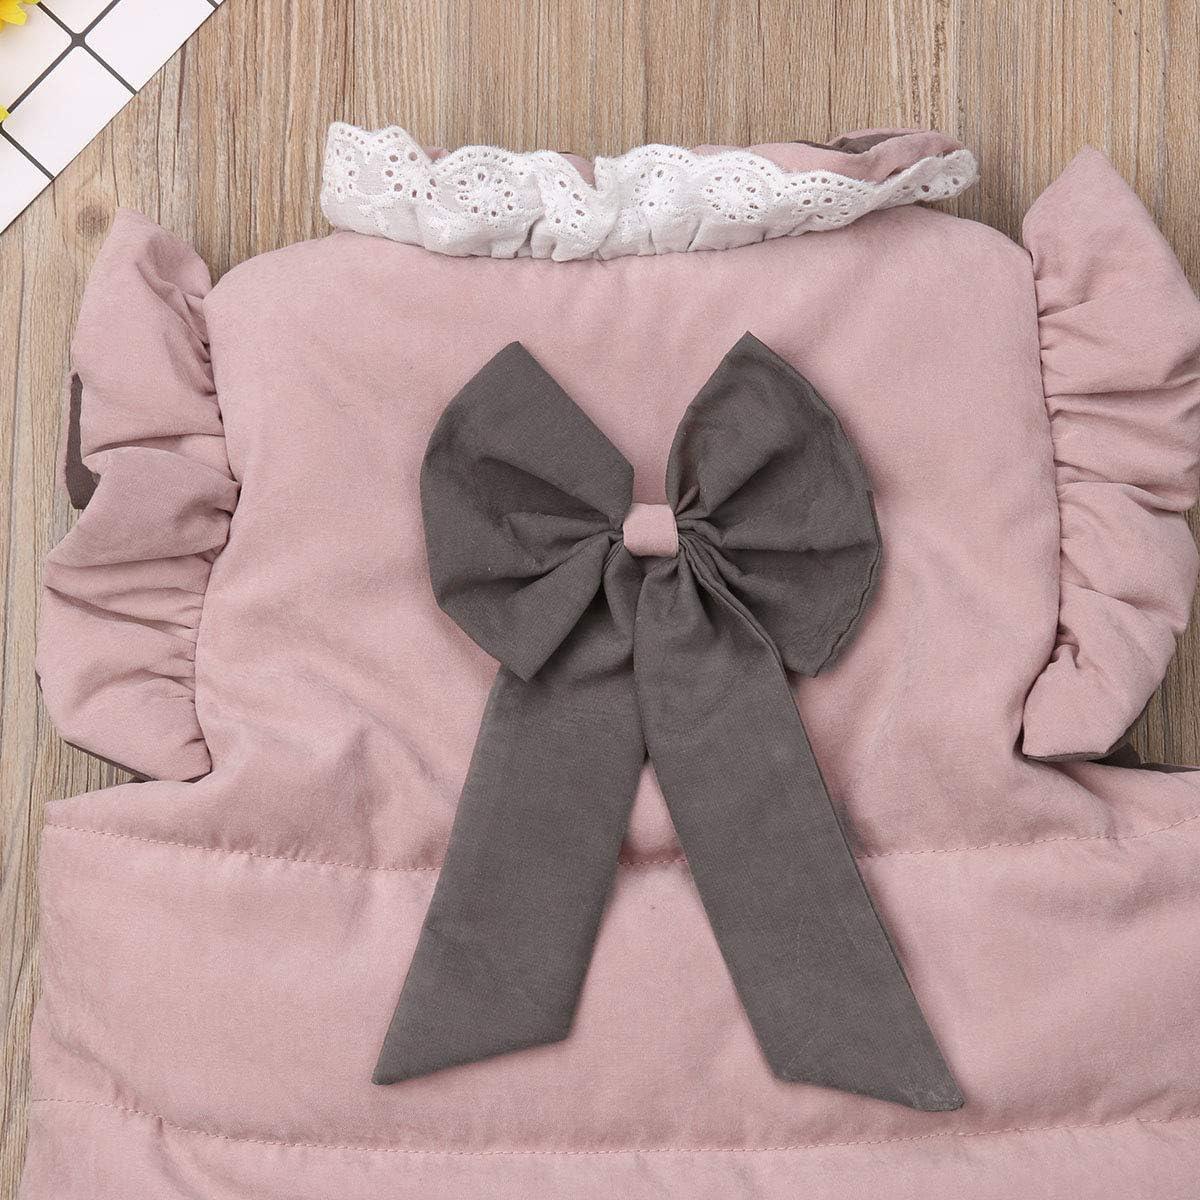 Baby Girl Cotton Warm Vests Unisex Infant Toddler Baby Silk Like Padded Waistcoat